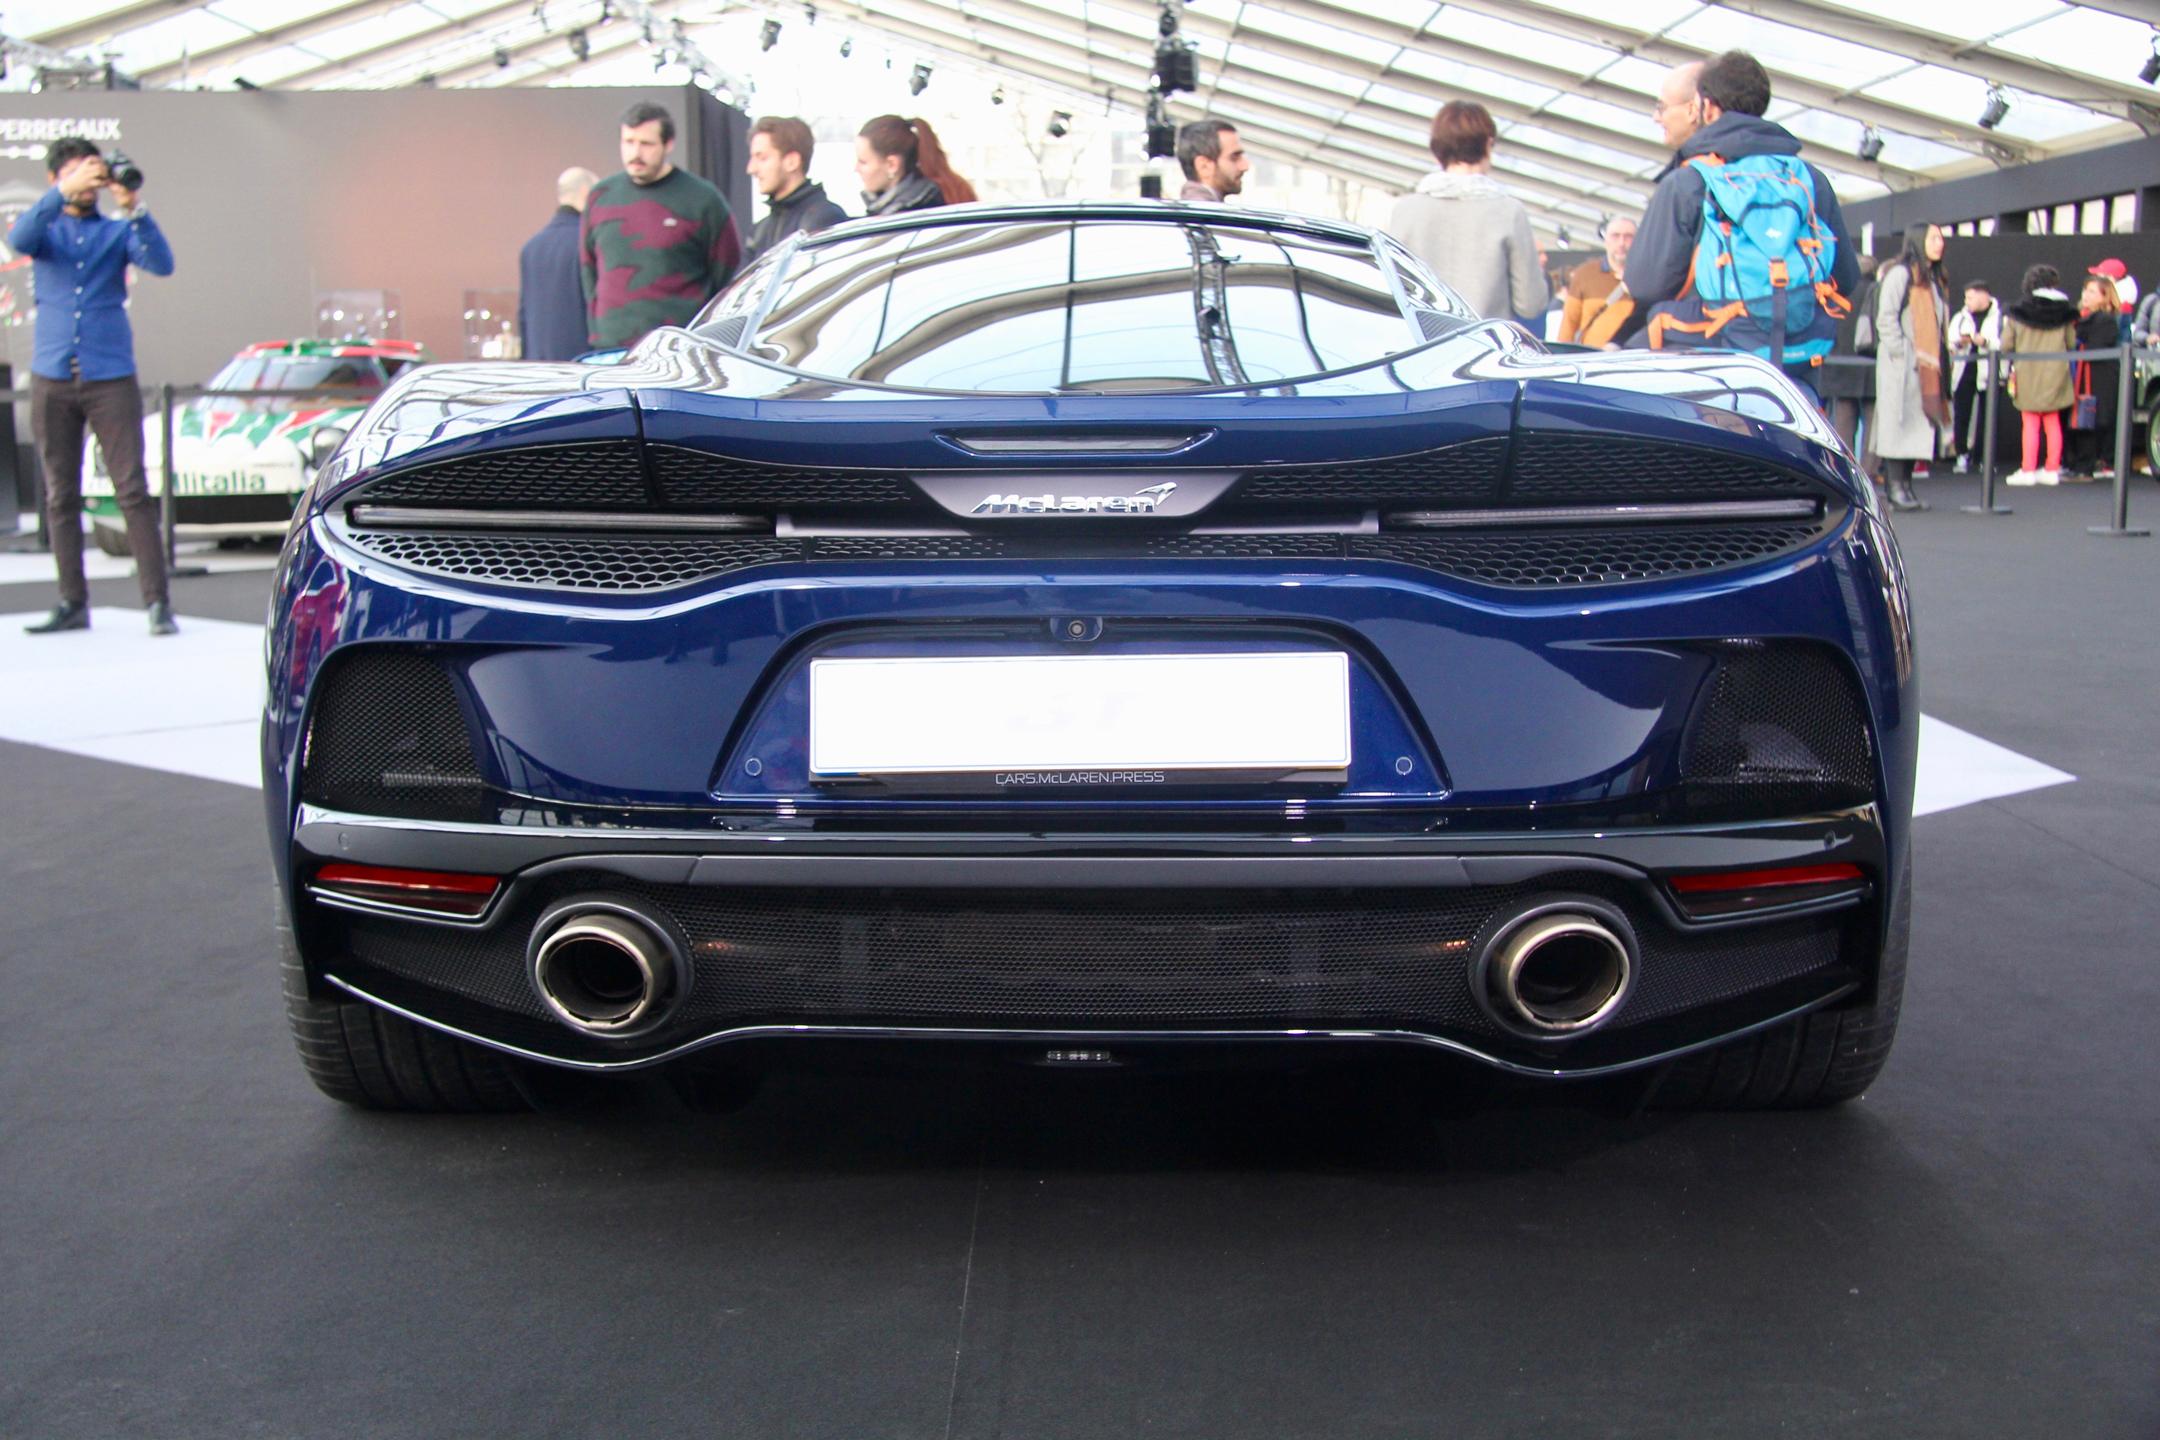 McLaren GT - rear face / face arrière - Festival Automobile International - 2020 - exposition Concept Cars - Design Automobile - photo Ludo Ferrari